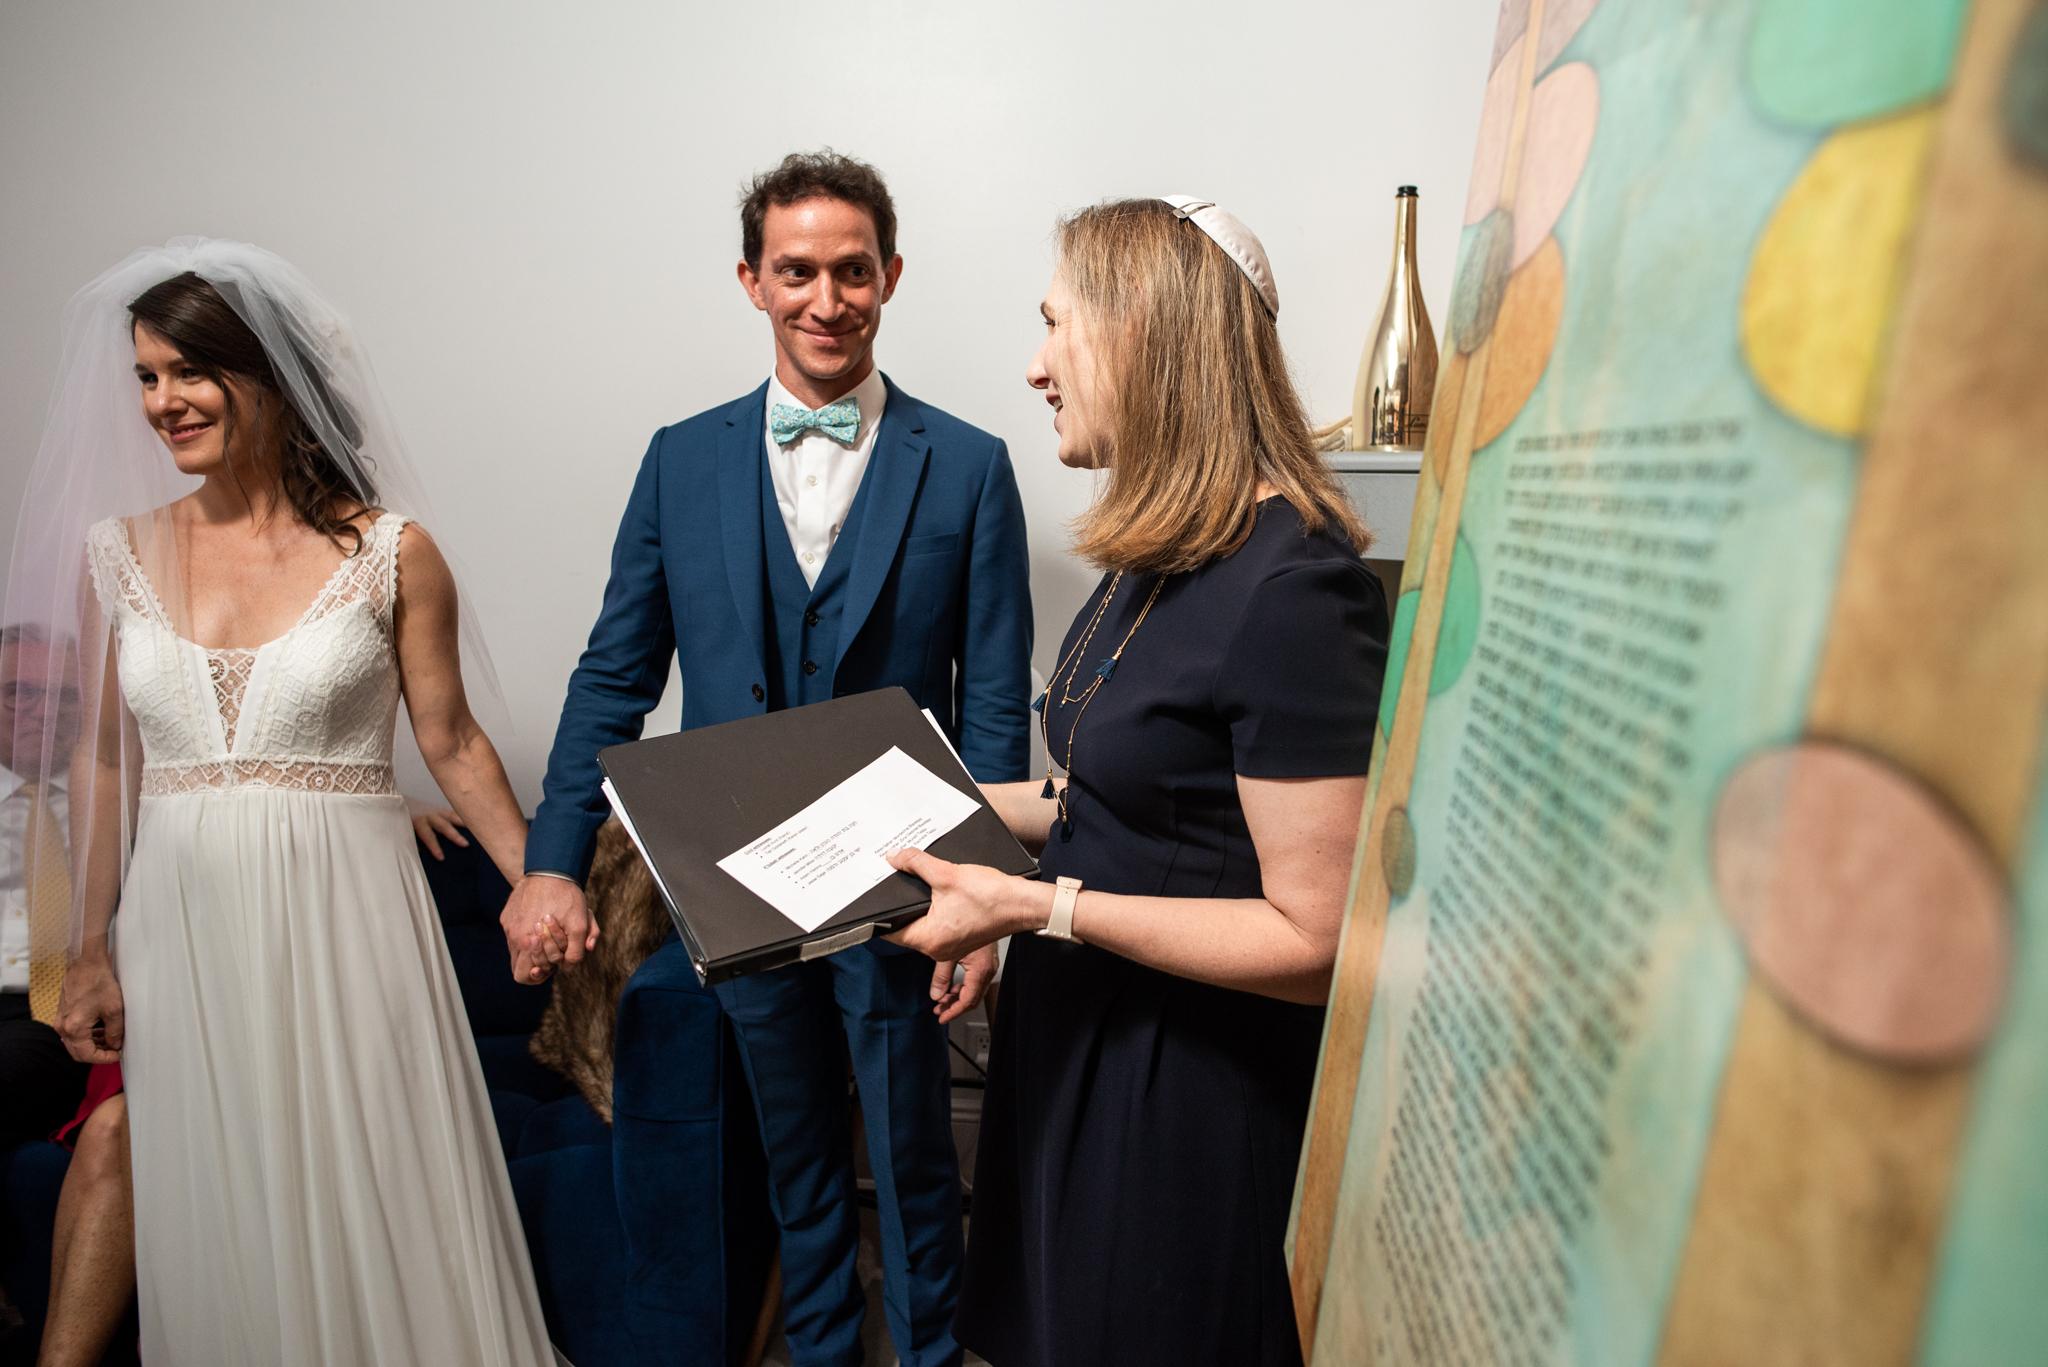 Keren & Jonathan's Wedding by Romina Hendlin @TheOtherRomina-010.jpg